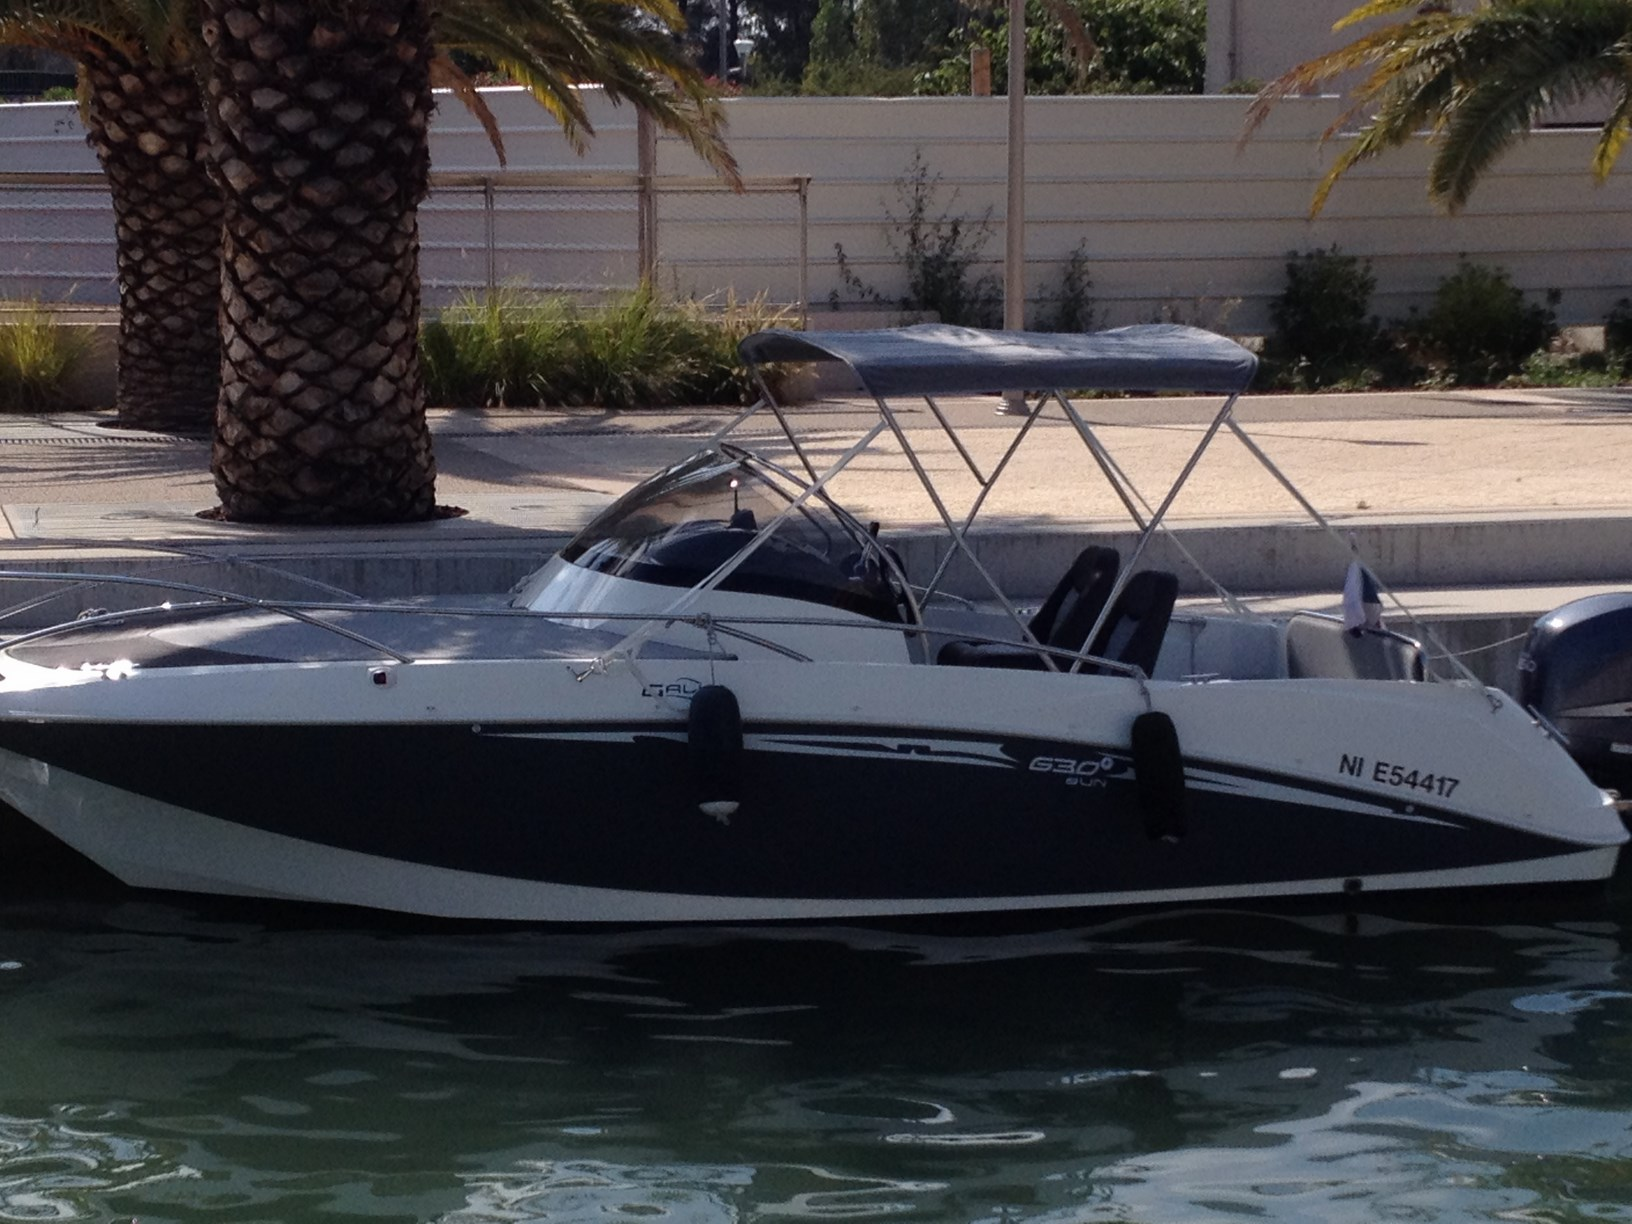 bateau moteur 2012 galia 630 sundeck